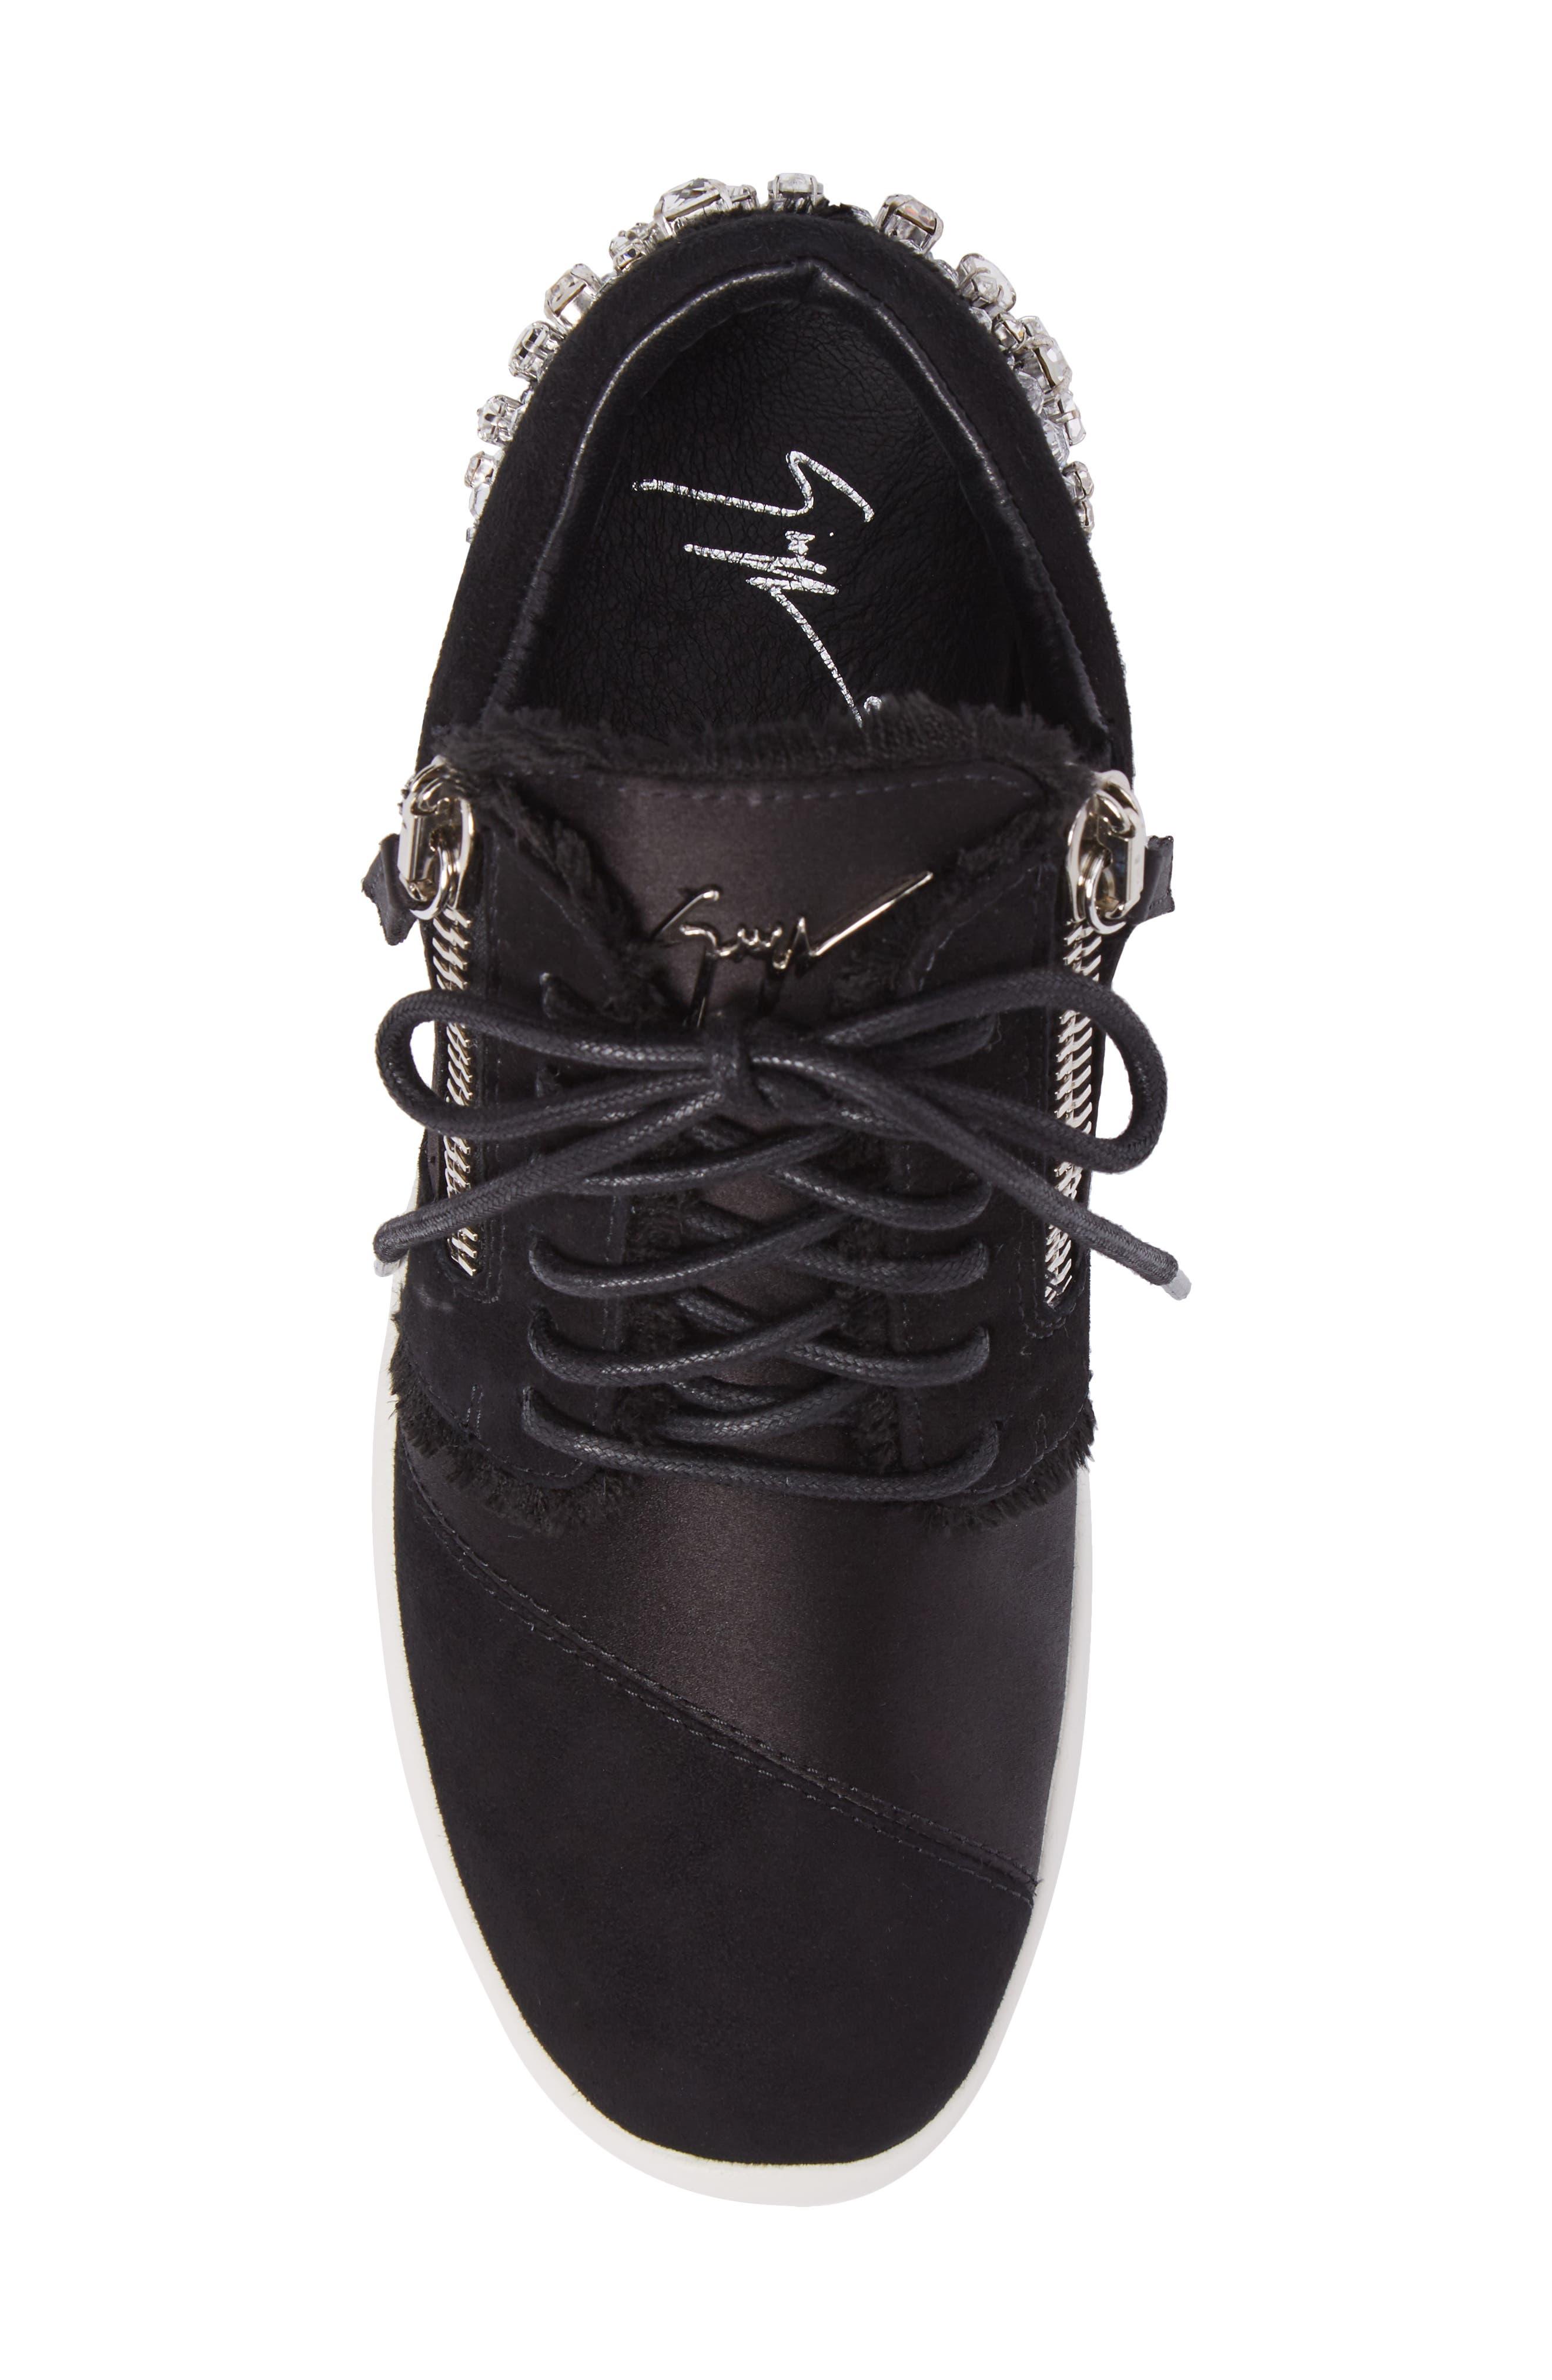 GIUSEPPE ZANOTTI,                             Swarovski Crystal Embellished Sneaker,                             Alternate thumbnail 5, color,                             001